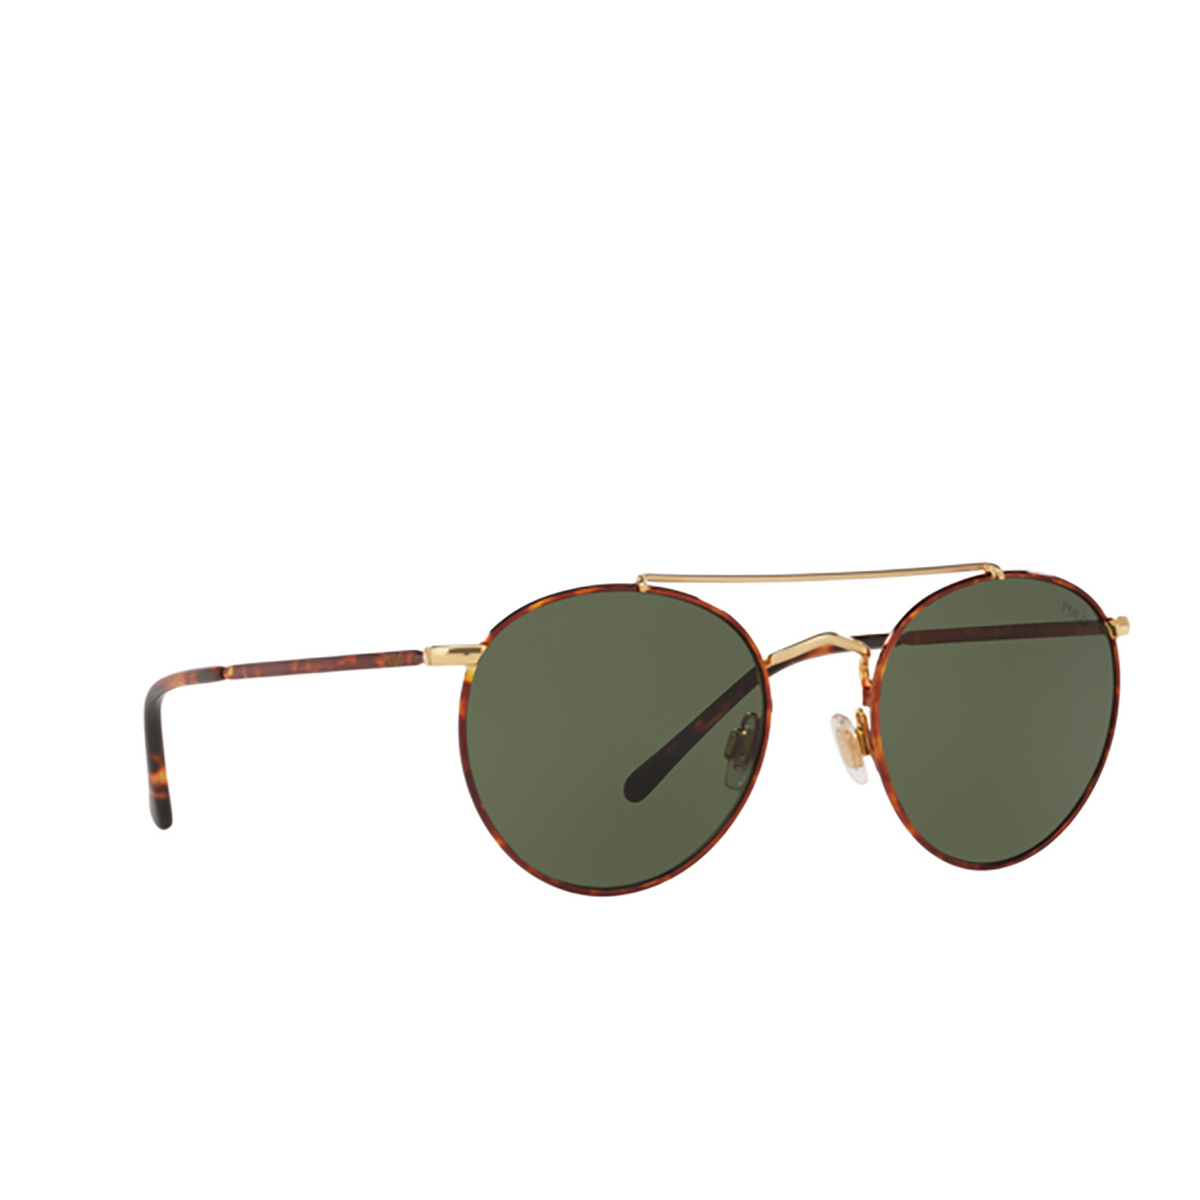 Polo Ralph Lauren® Round Sunglasses: PH3114 color Havana On Shiny Gold 938471.